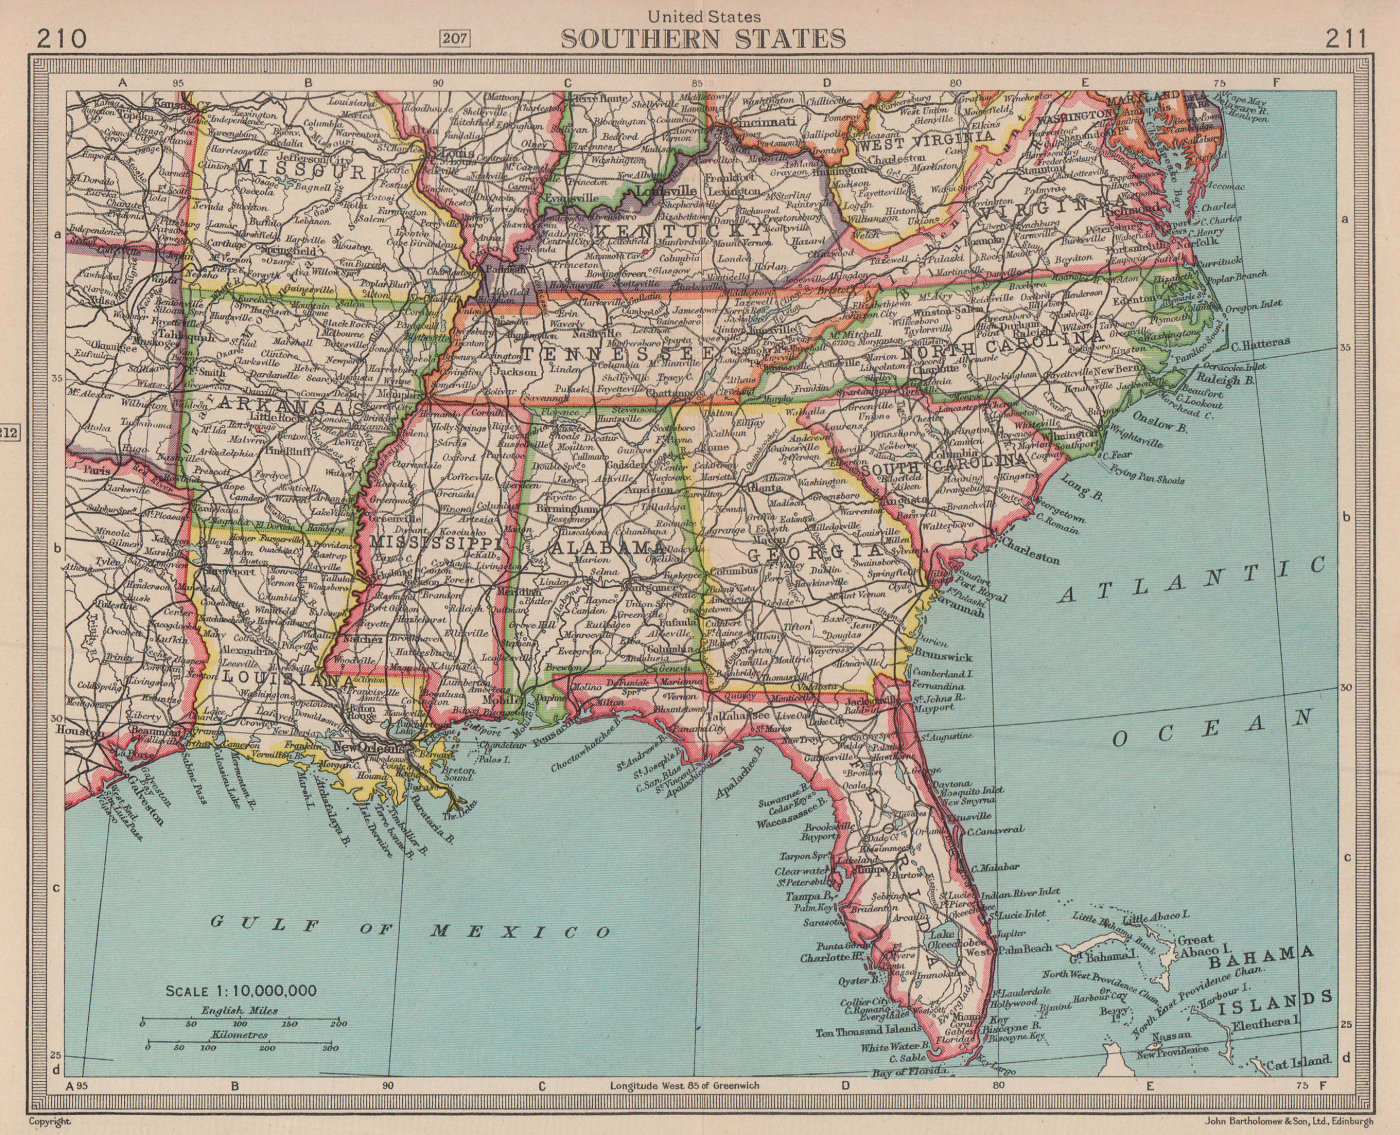 United States Southern States. Southeastern USA. BARTHOLOMEW 1949 old map